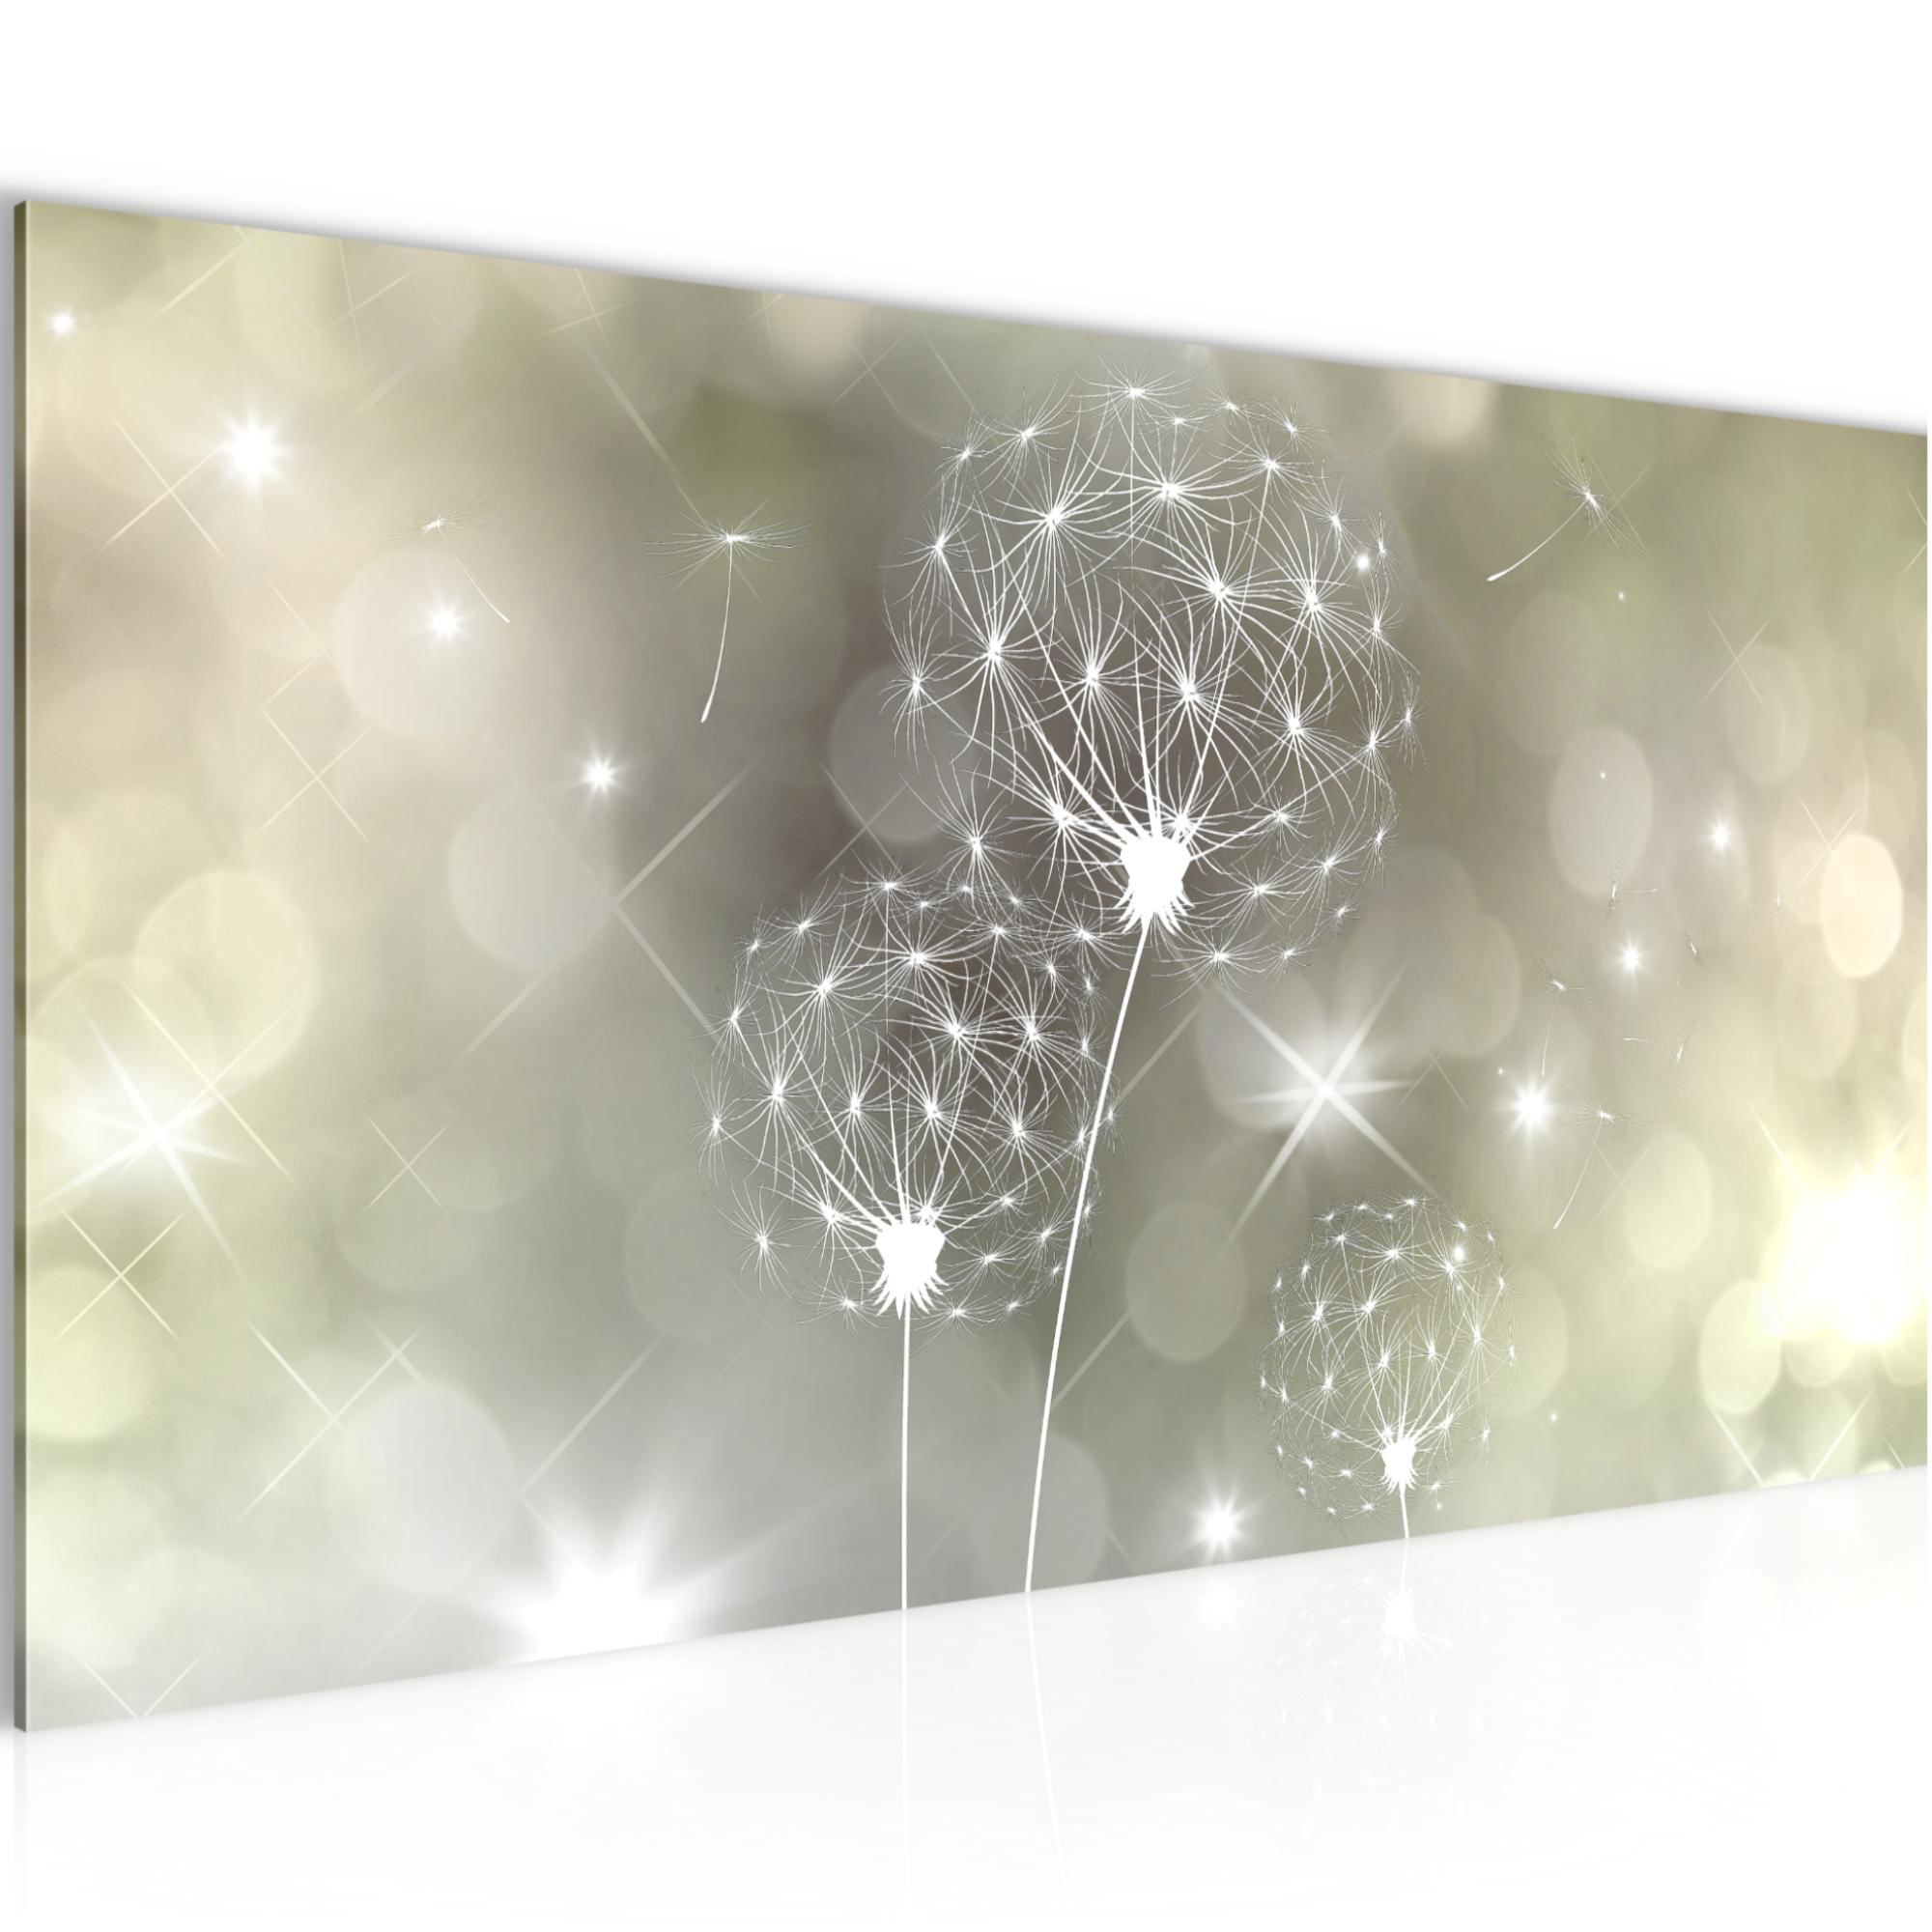 Bild Bilder Wandbild XXL Kunstdruck Leinwand aus Vlies 100x40 cm Pusteblume